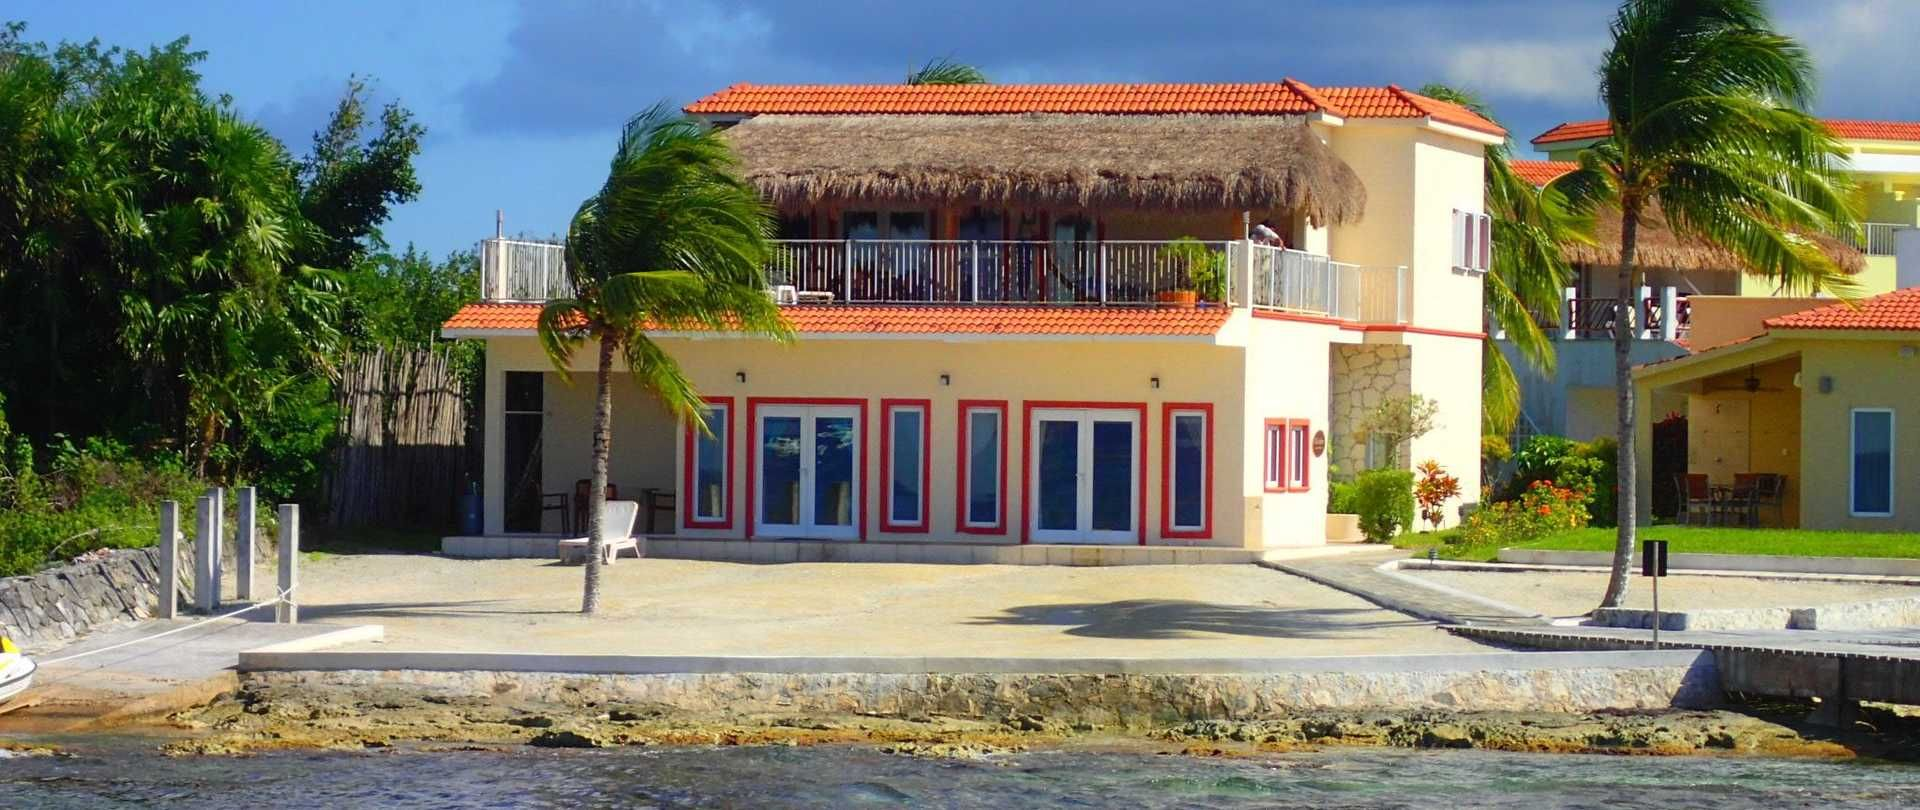 Img 3008 Cozumel Beachbeach House